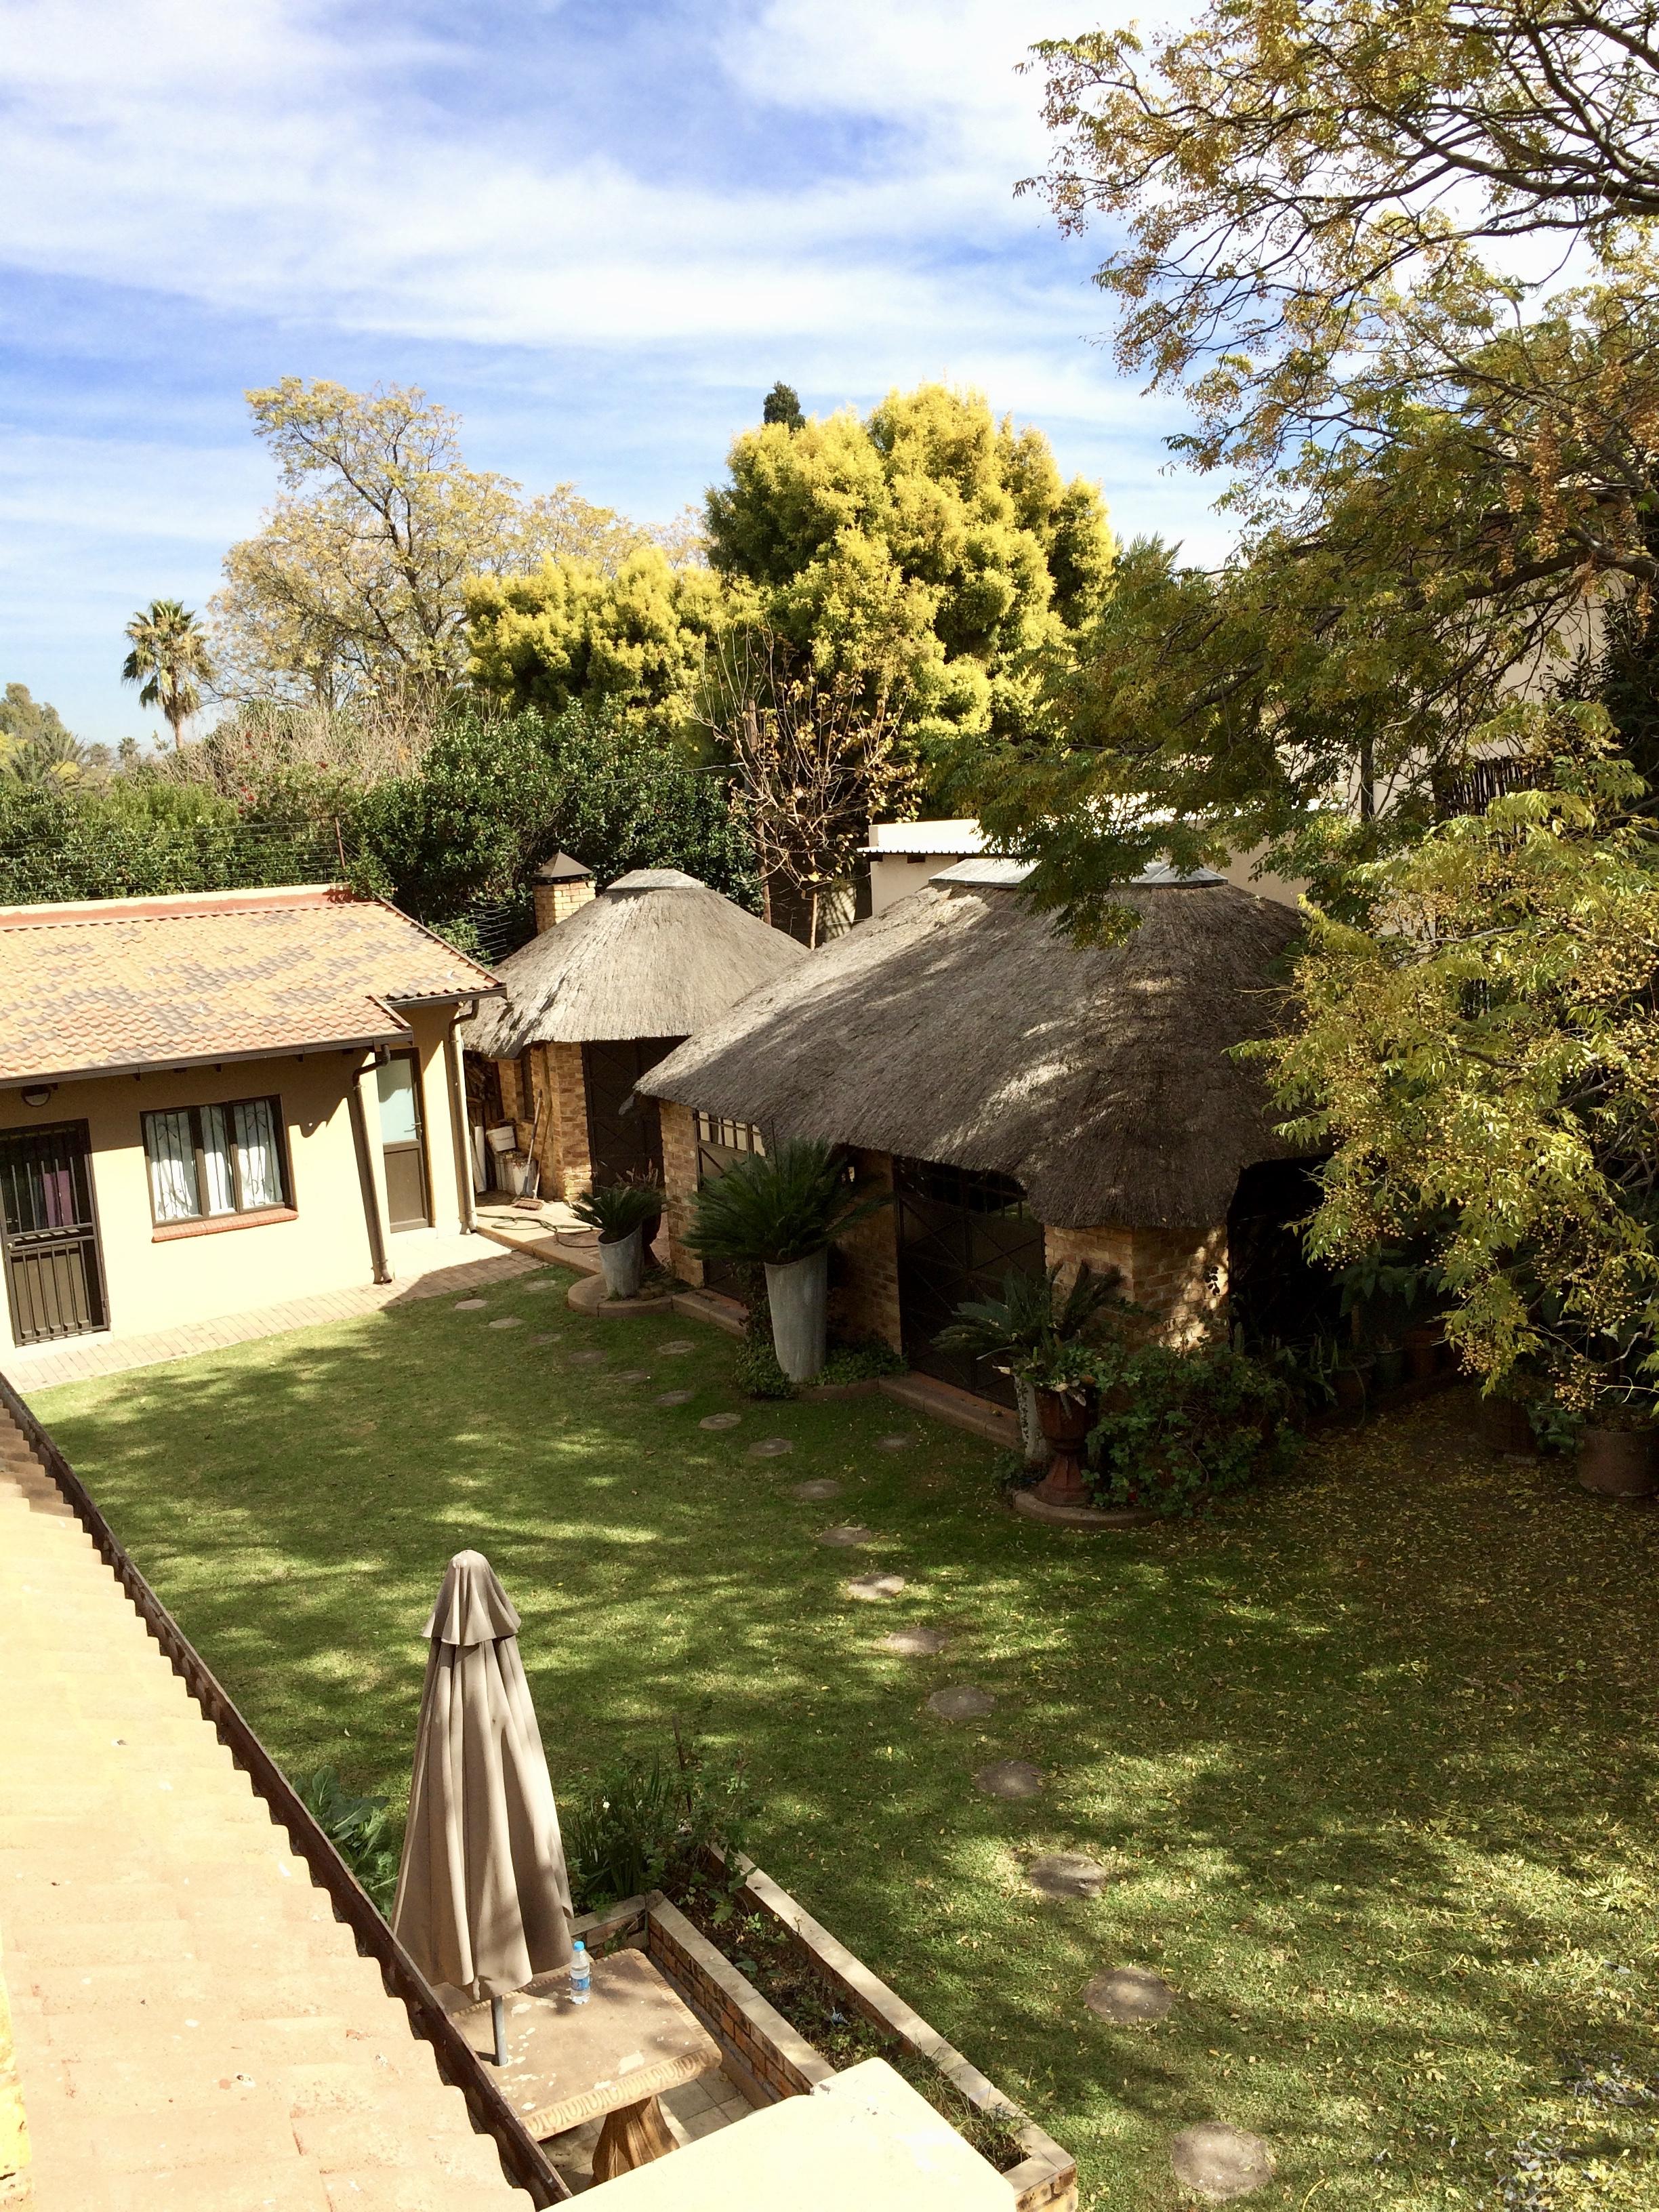 160 4th Avenue, Edenvale, Gauteng, 6 Bedrooms Bedrooms, ,6 BathroomsBathrooms,House,For sale,4th Avenue,1035